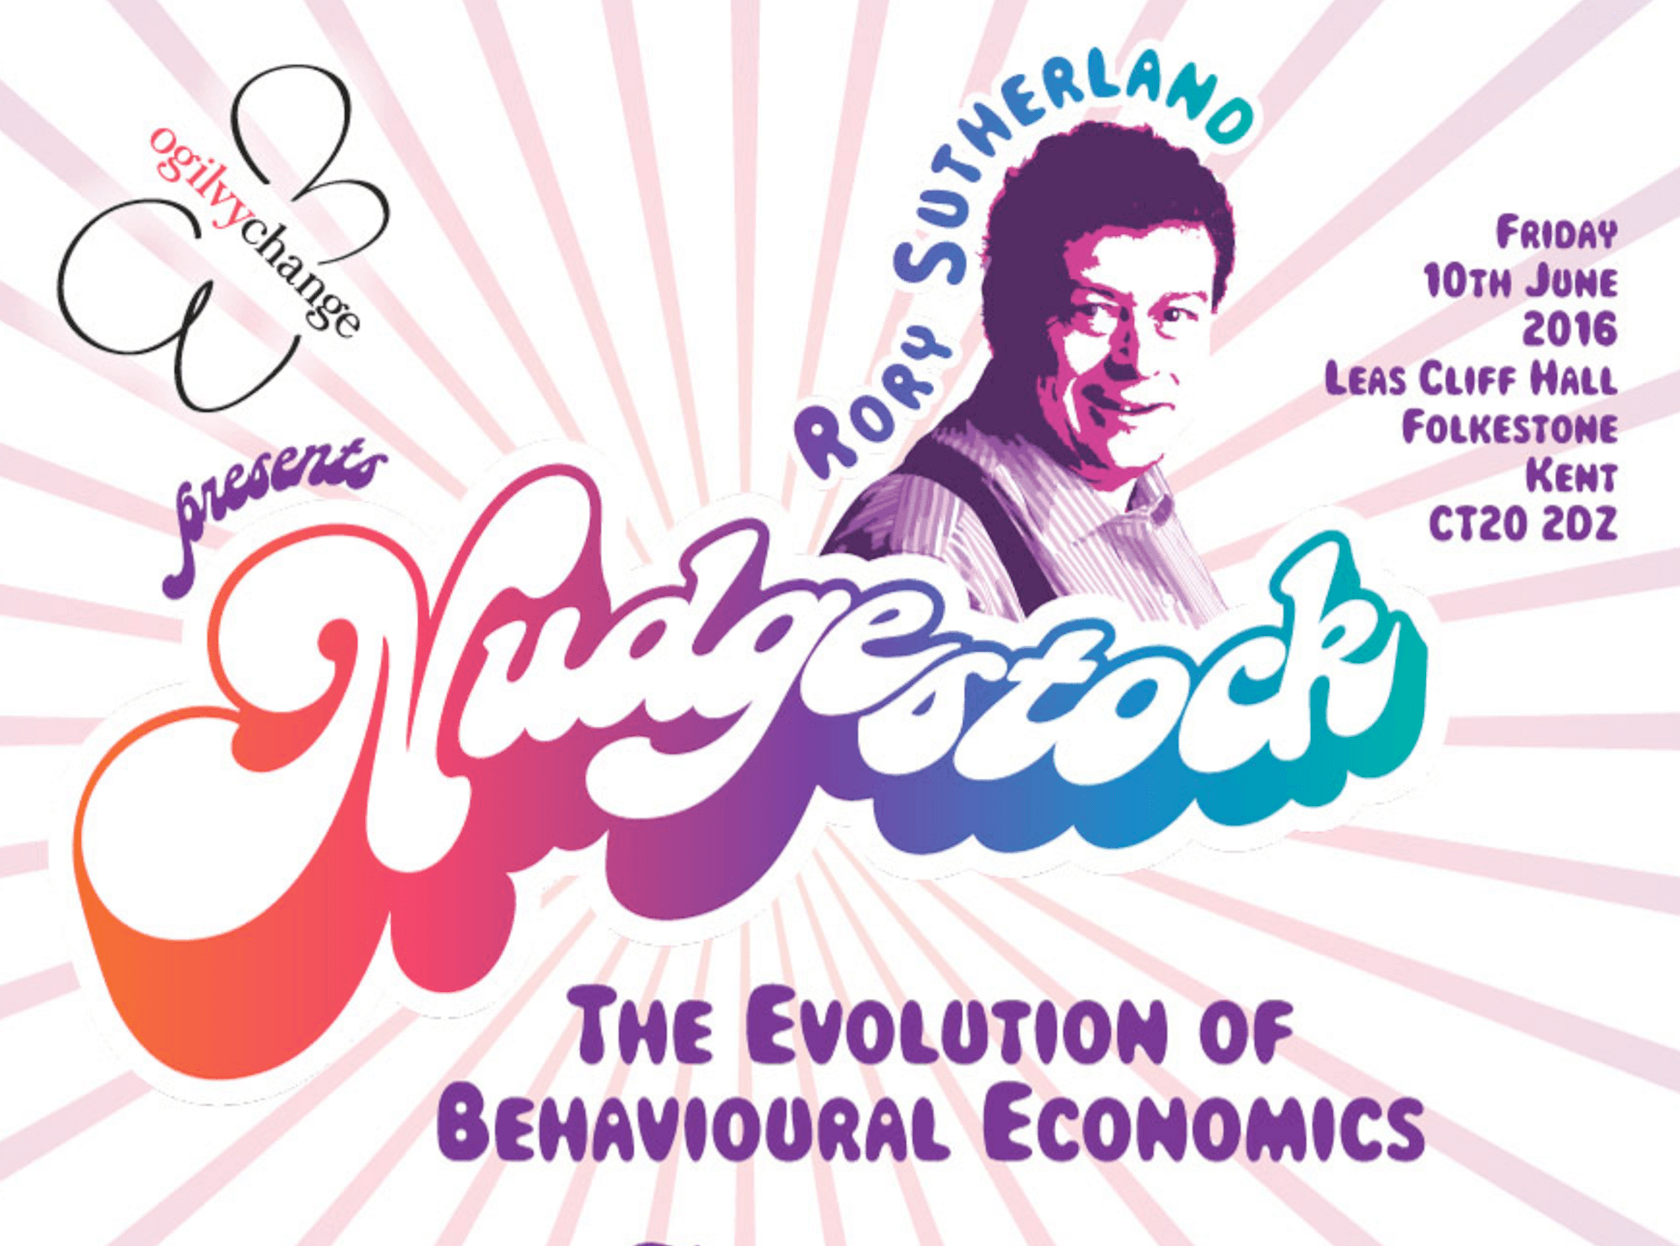 Nudgestock, The Evolution of Behavioural Economics